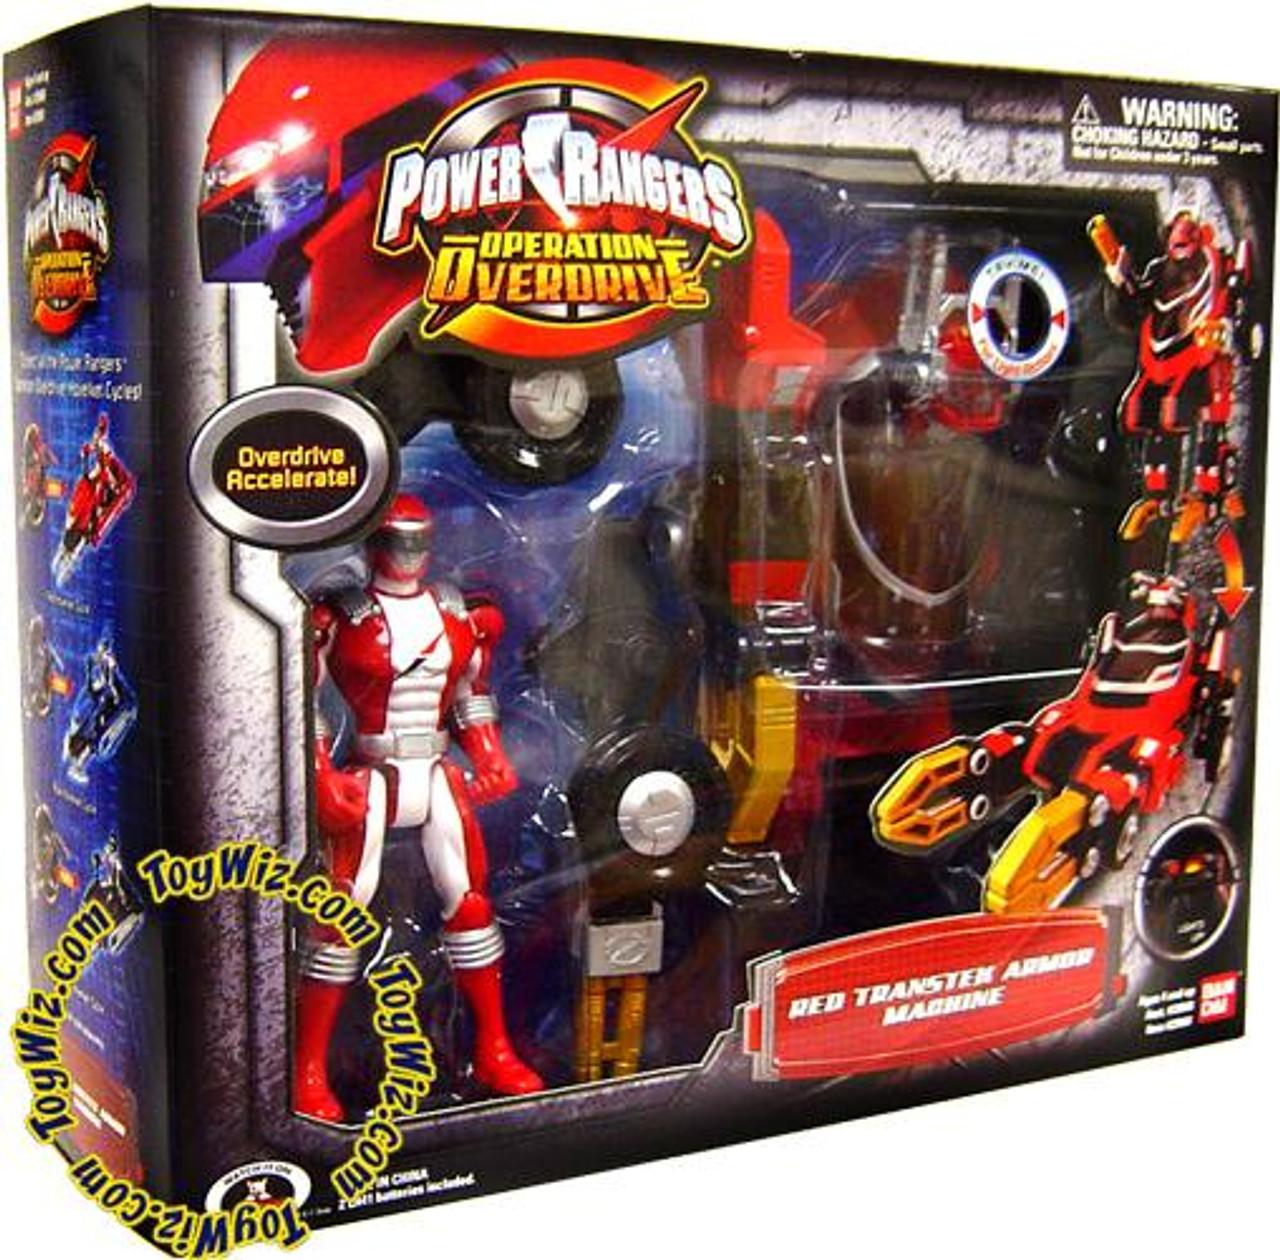 Power Rangers Operation Overdrive Red Transtek Armor Machine Action Figure Set